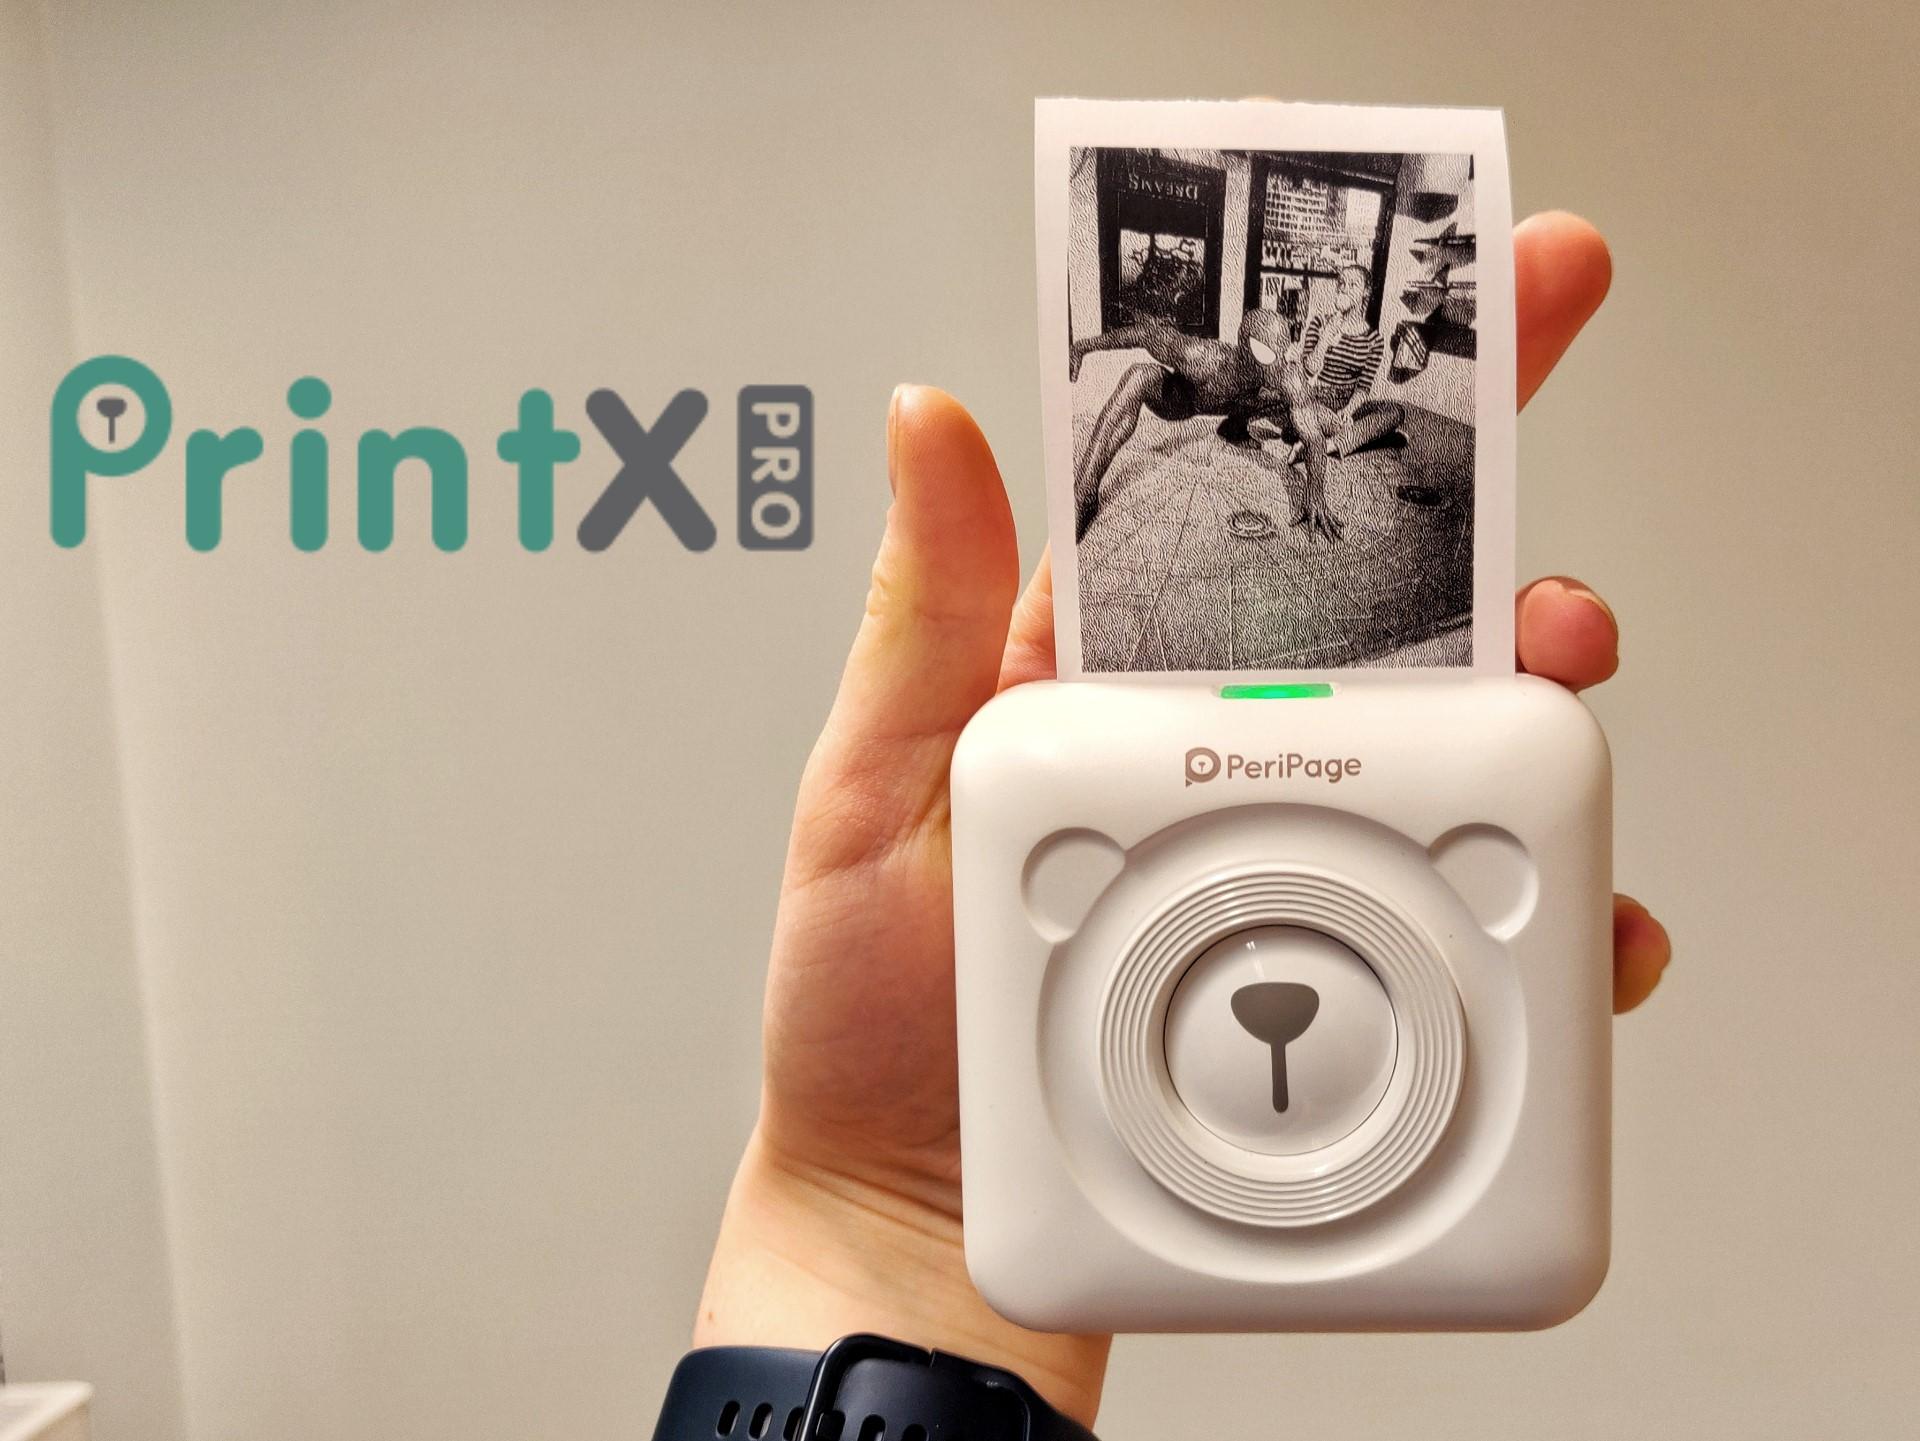 Features of PrintX Pro